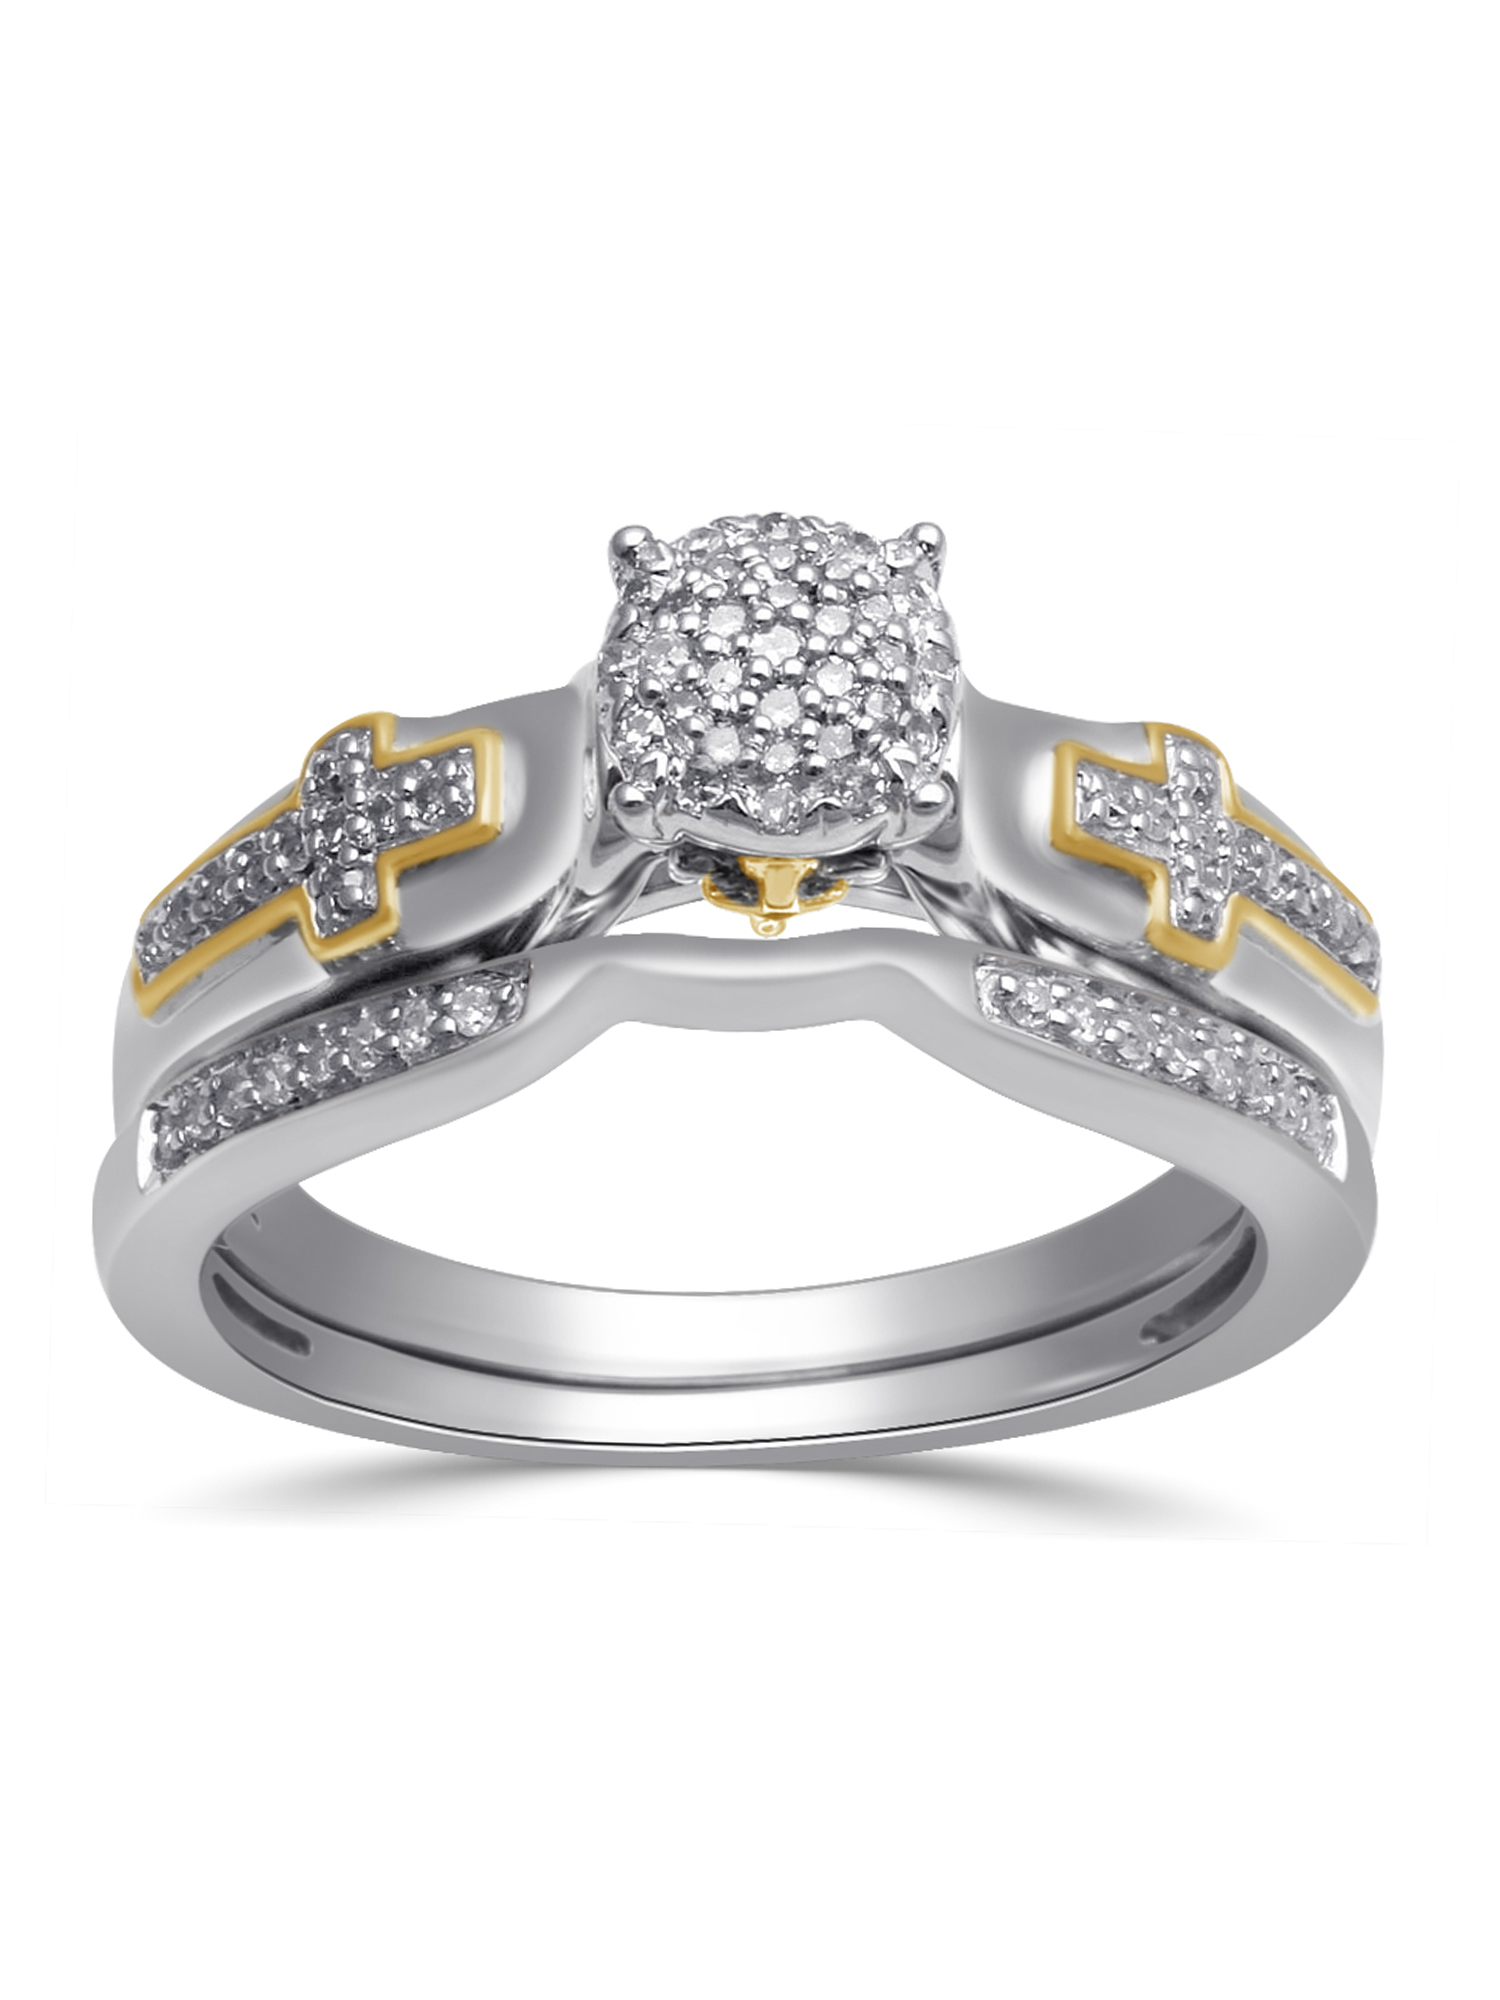 1/5 Carat T.W. Diamond 18kt Yellow Gold over Silver Bridal Set